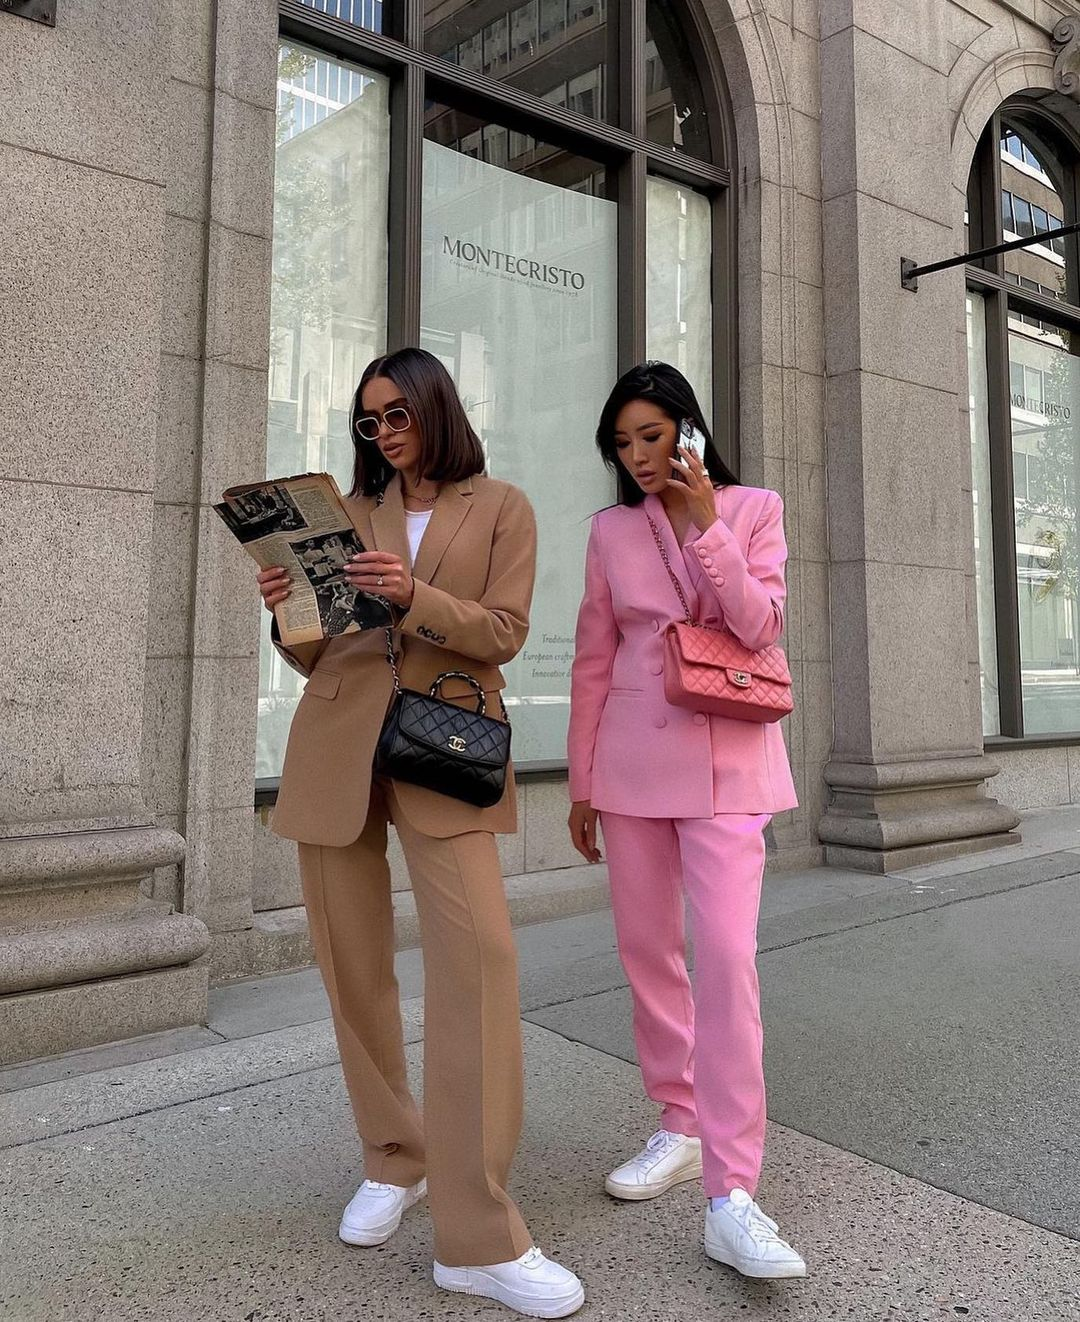 oversized jacket with pockets de Zara sur zarastreetstyle